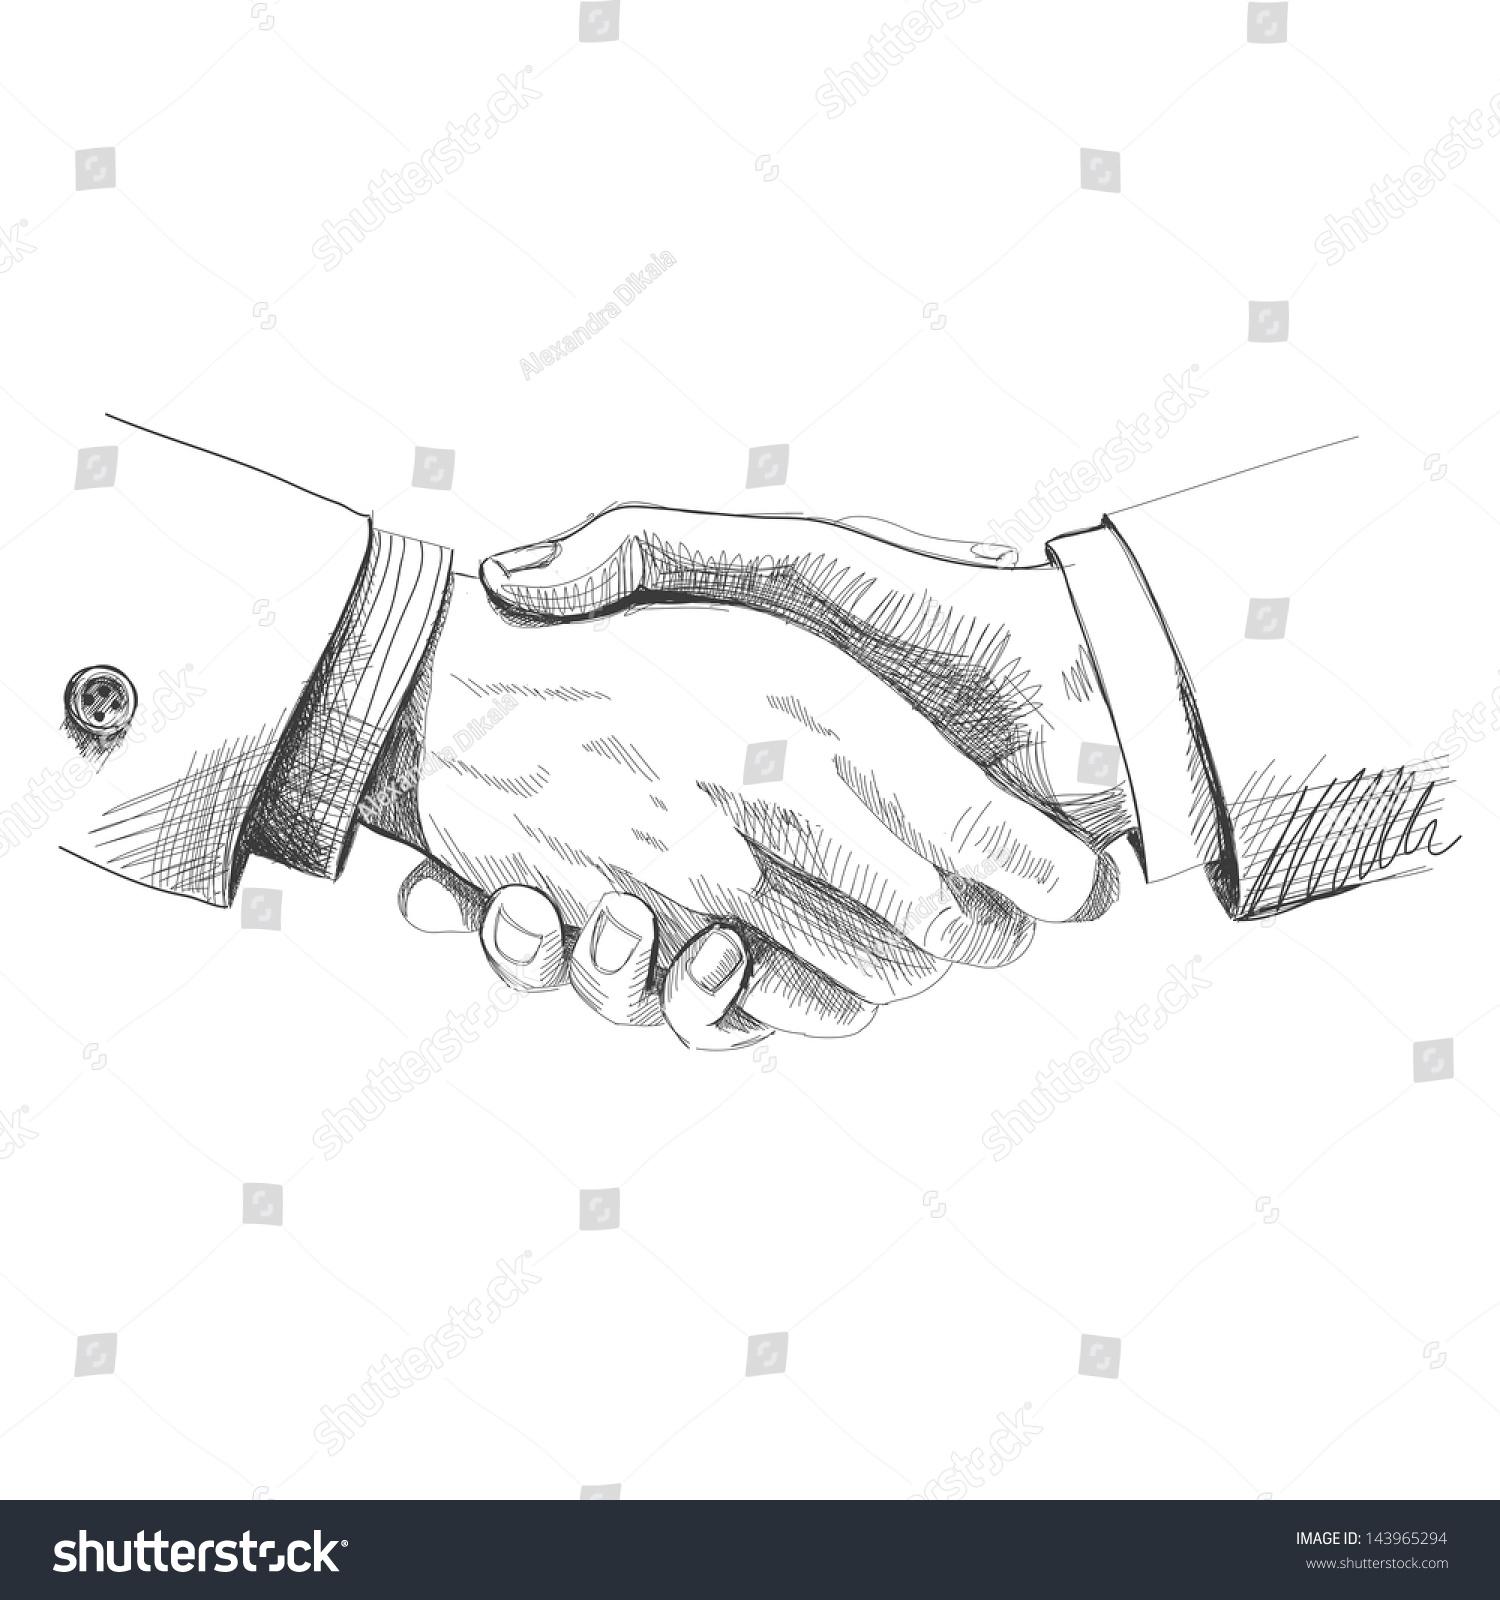 Partneship. Sketch Handshake Stock Vector Illustration ...